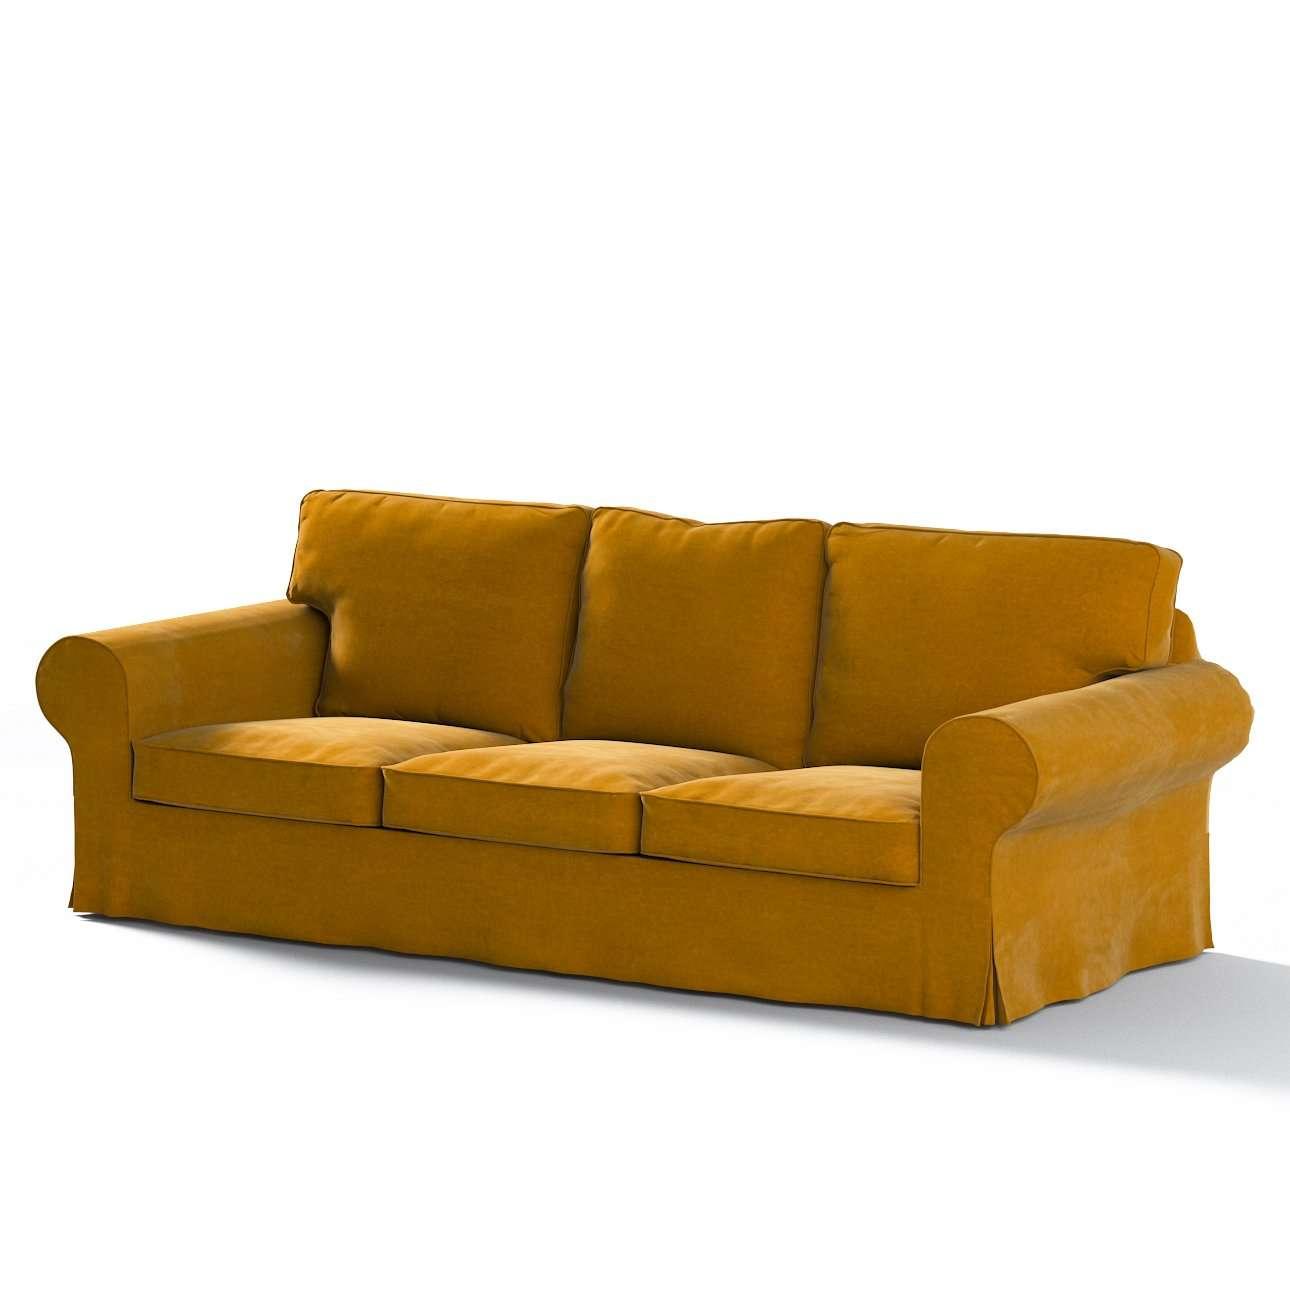 Remarkable Ektorp 3 Seater Sofa Bed Cover For Model On Sale In Ikea Since 2013 Frankydiablos Diy Chair Ideas Frankydiabloscom